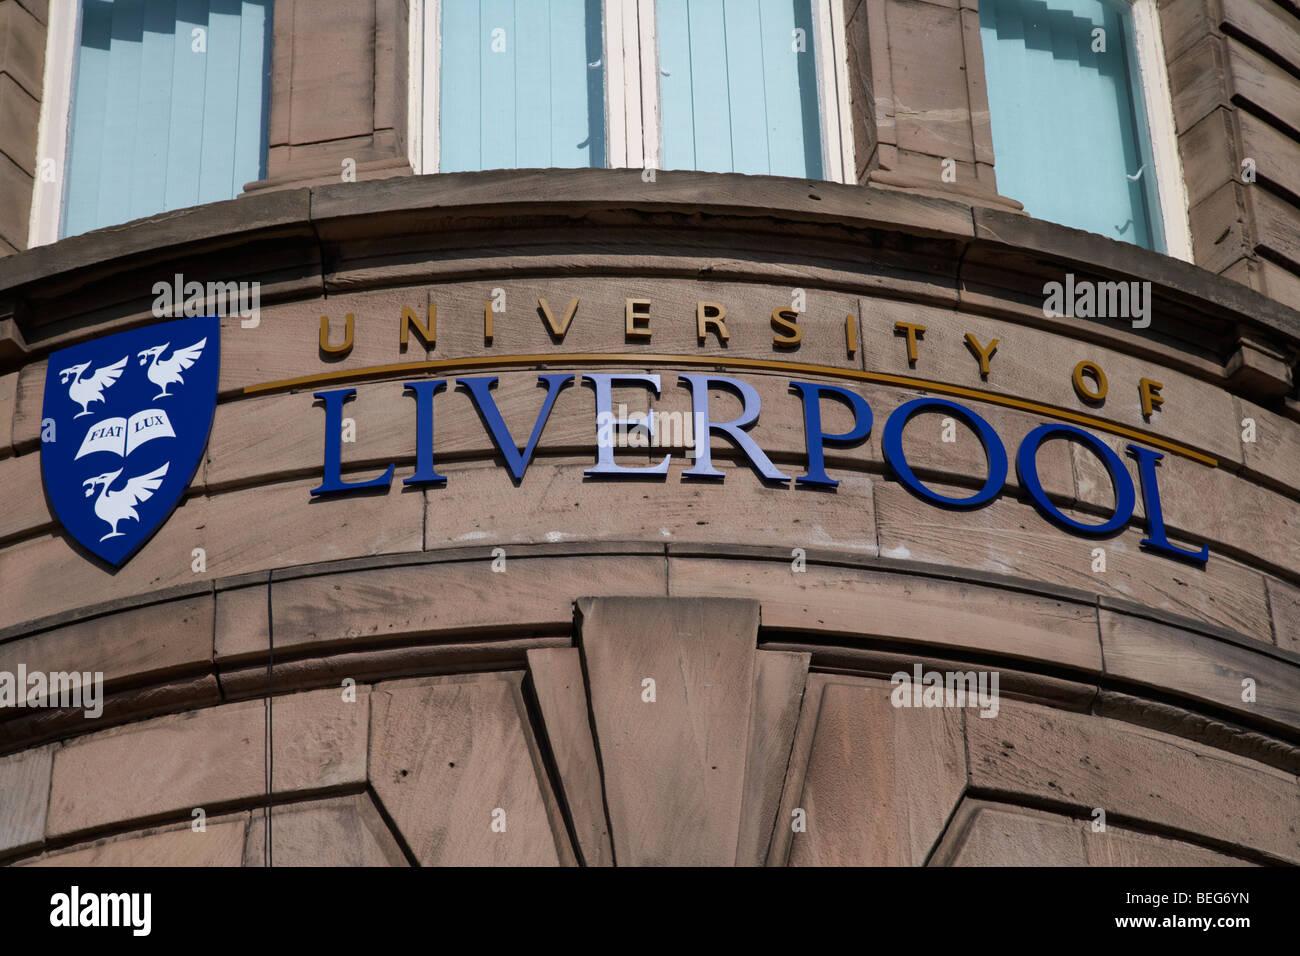 logo of the university of liverpool on a university building merseyside england uk - Stock Image